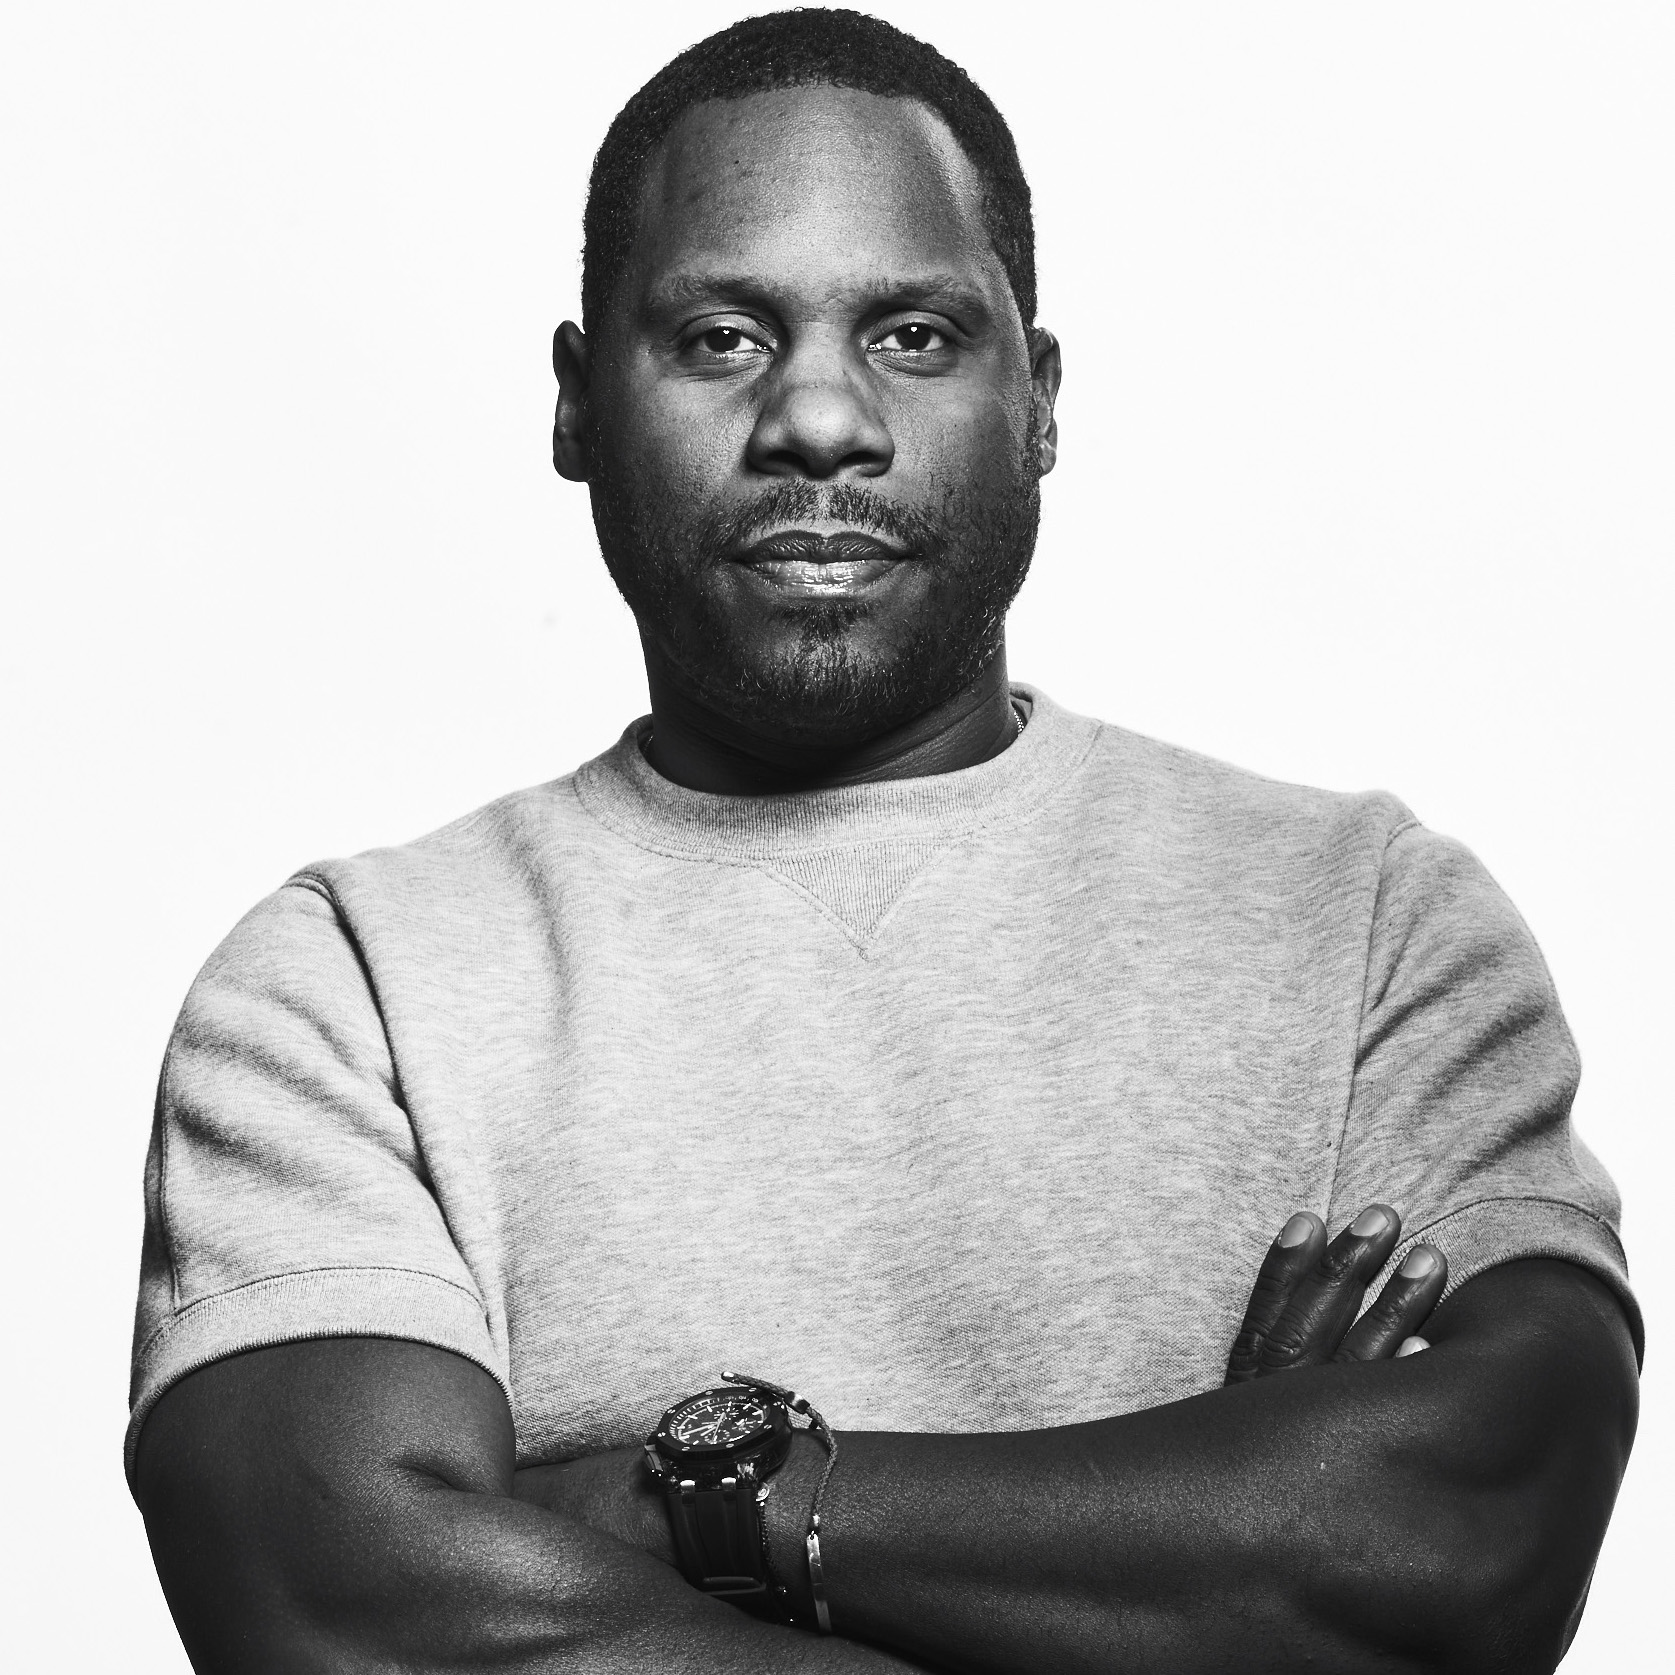 Omar-Johnson-photo.jpg